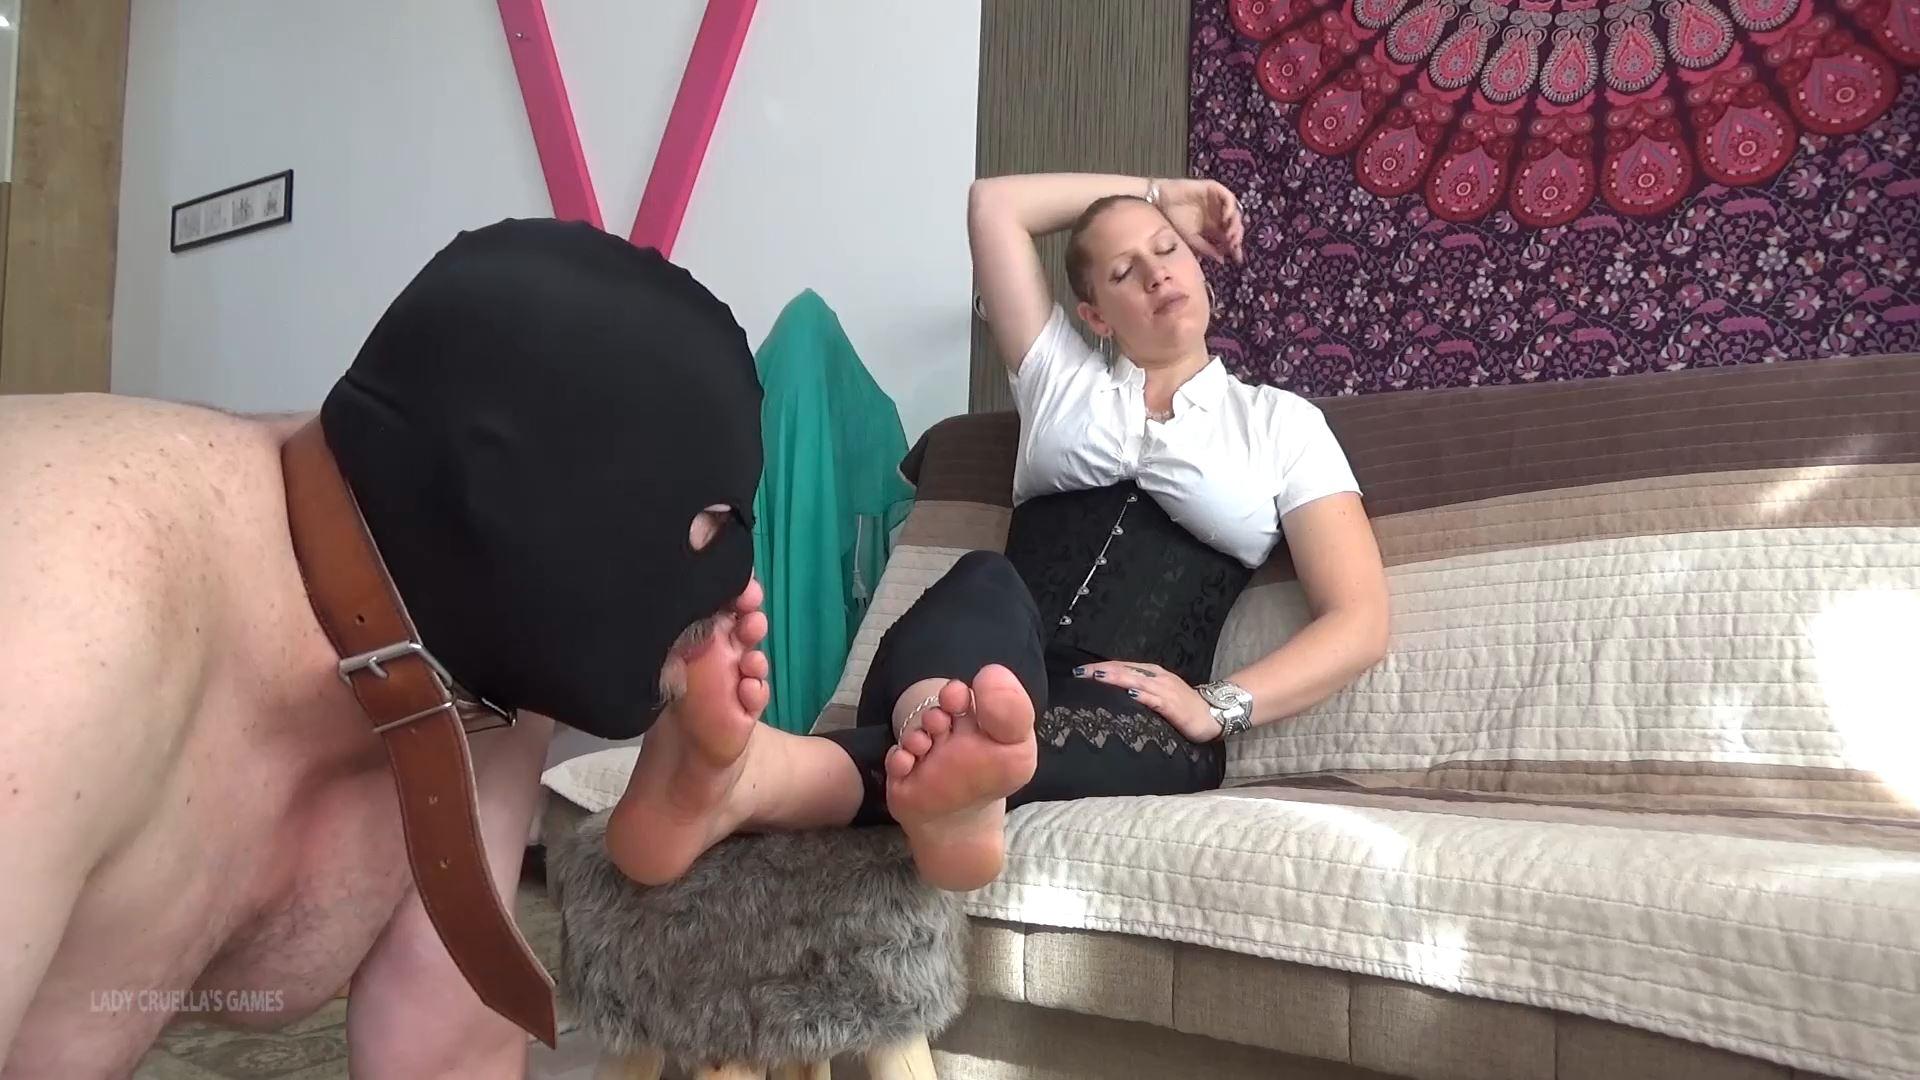 Lady Cruella In Scene: FEMDOM THERAPY - FOOT WORSHIP - LADY CRUELLAS GAMES - FULL HD/1080p/MP4